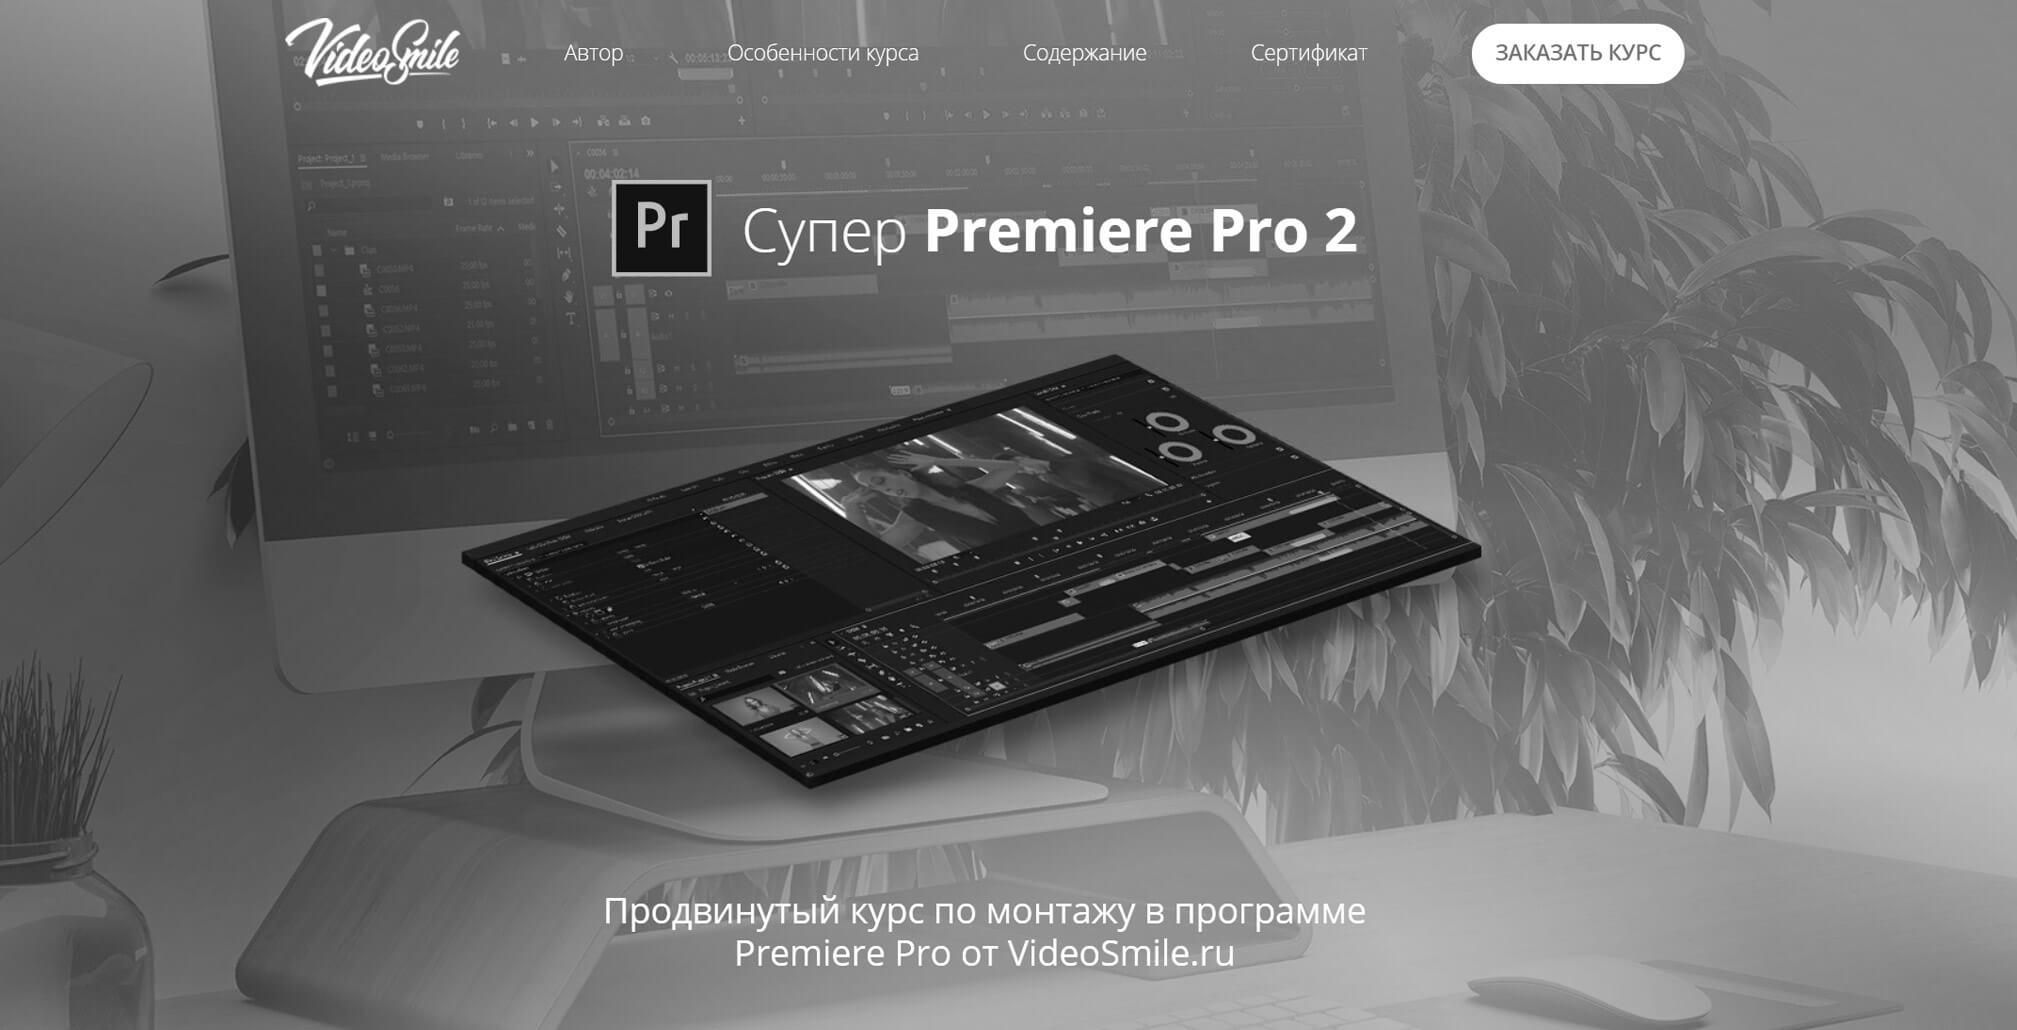 Купон Супер Premiere Pro 2 на скидку